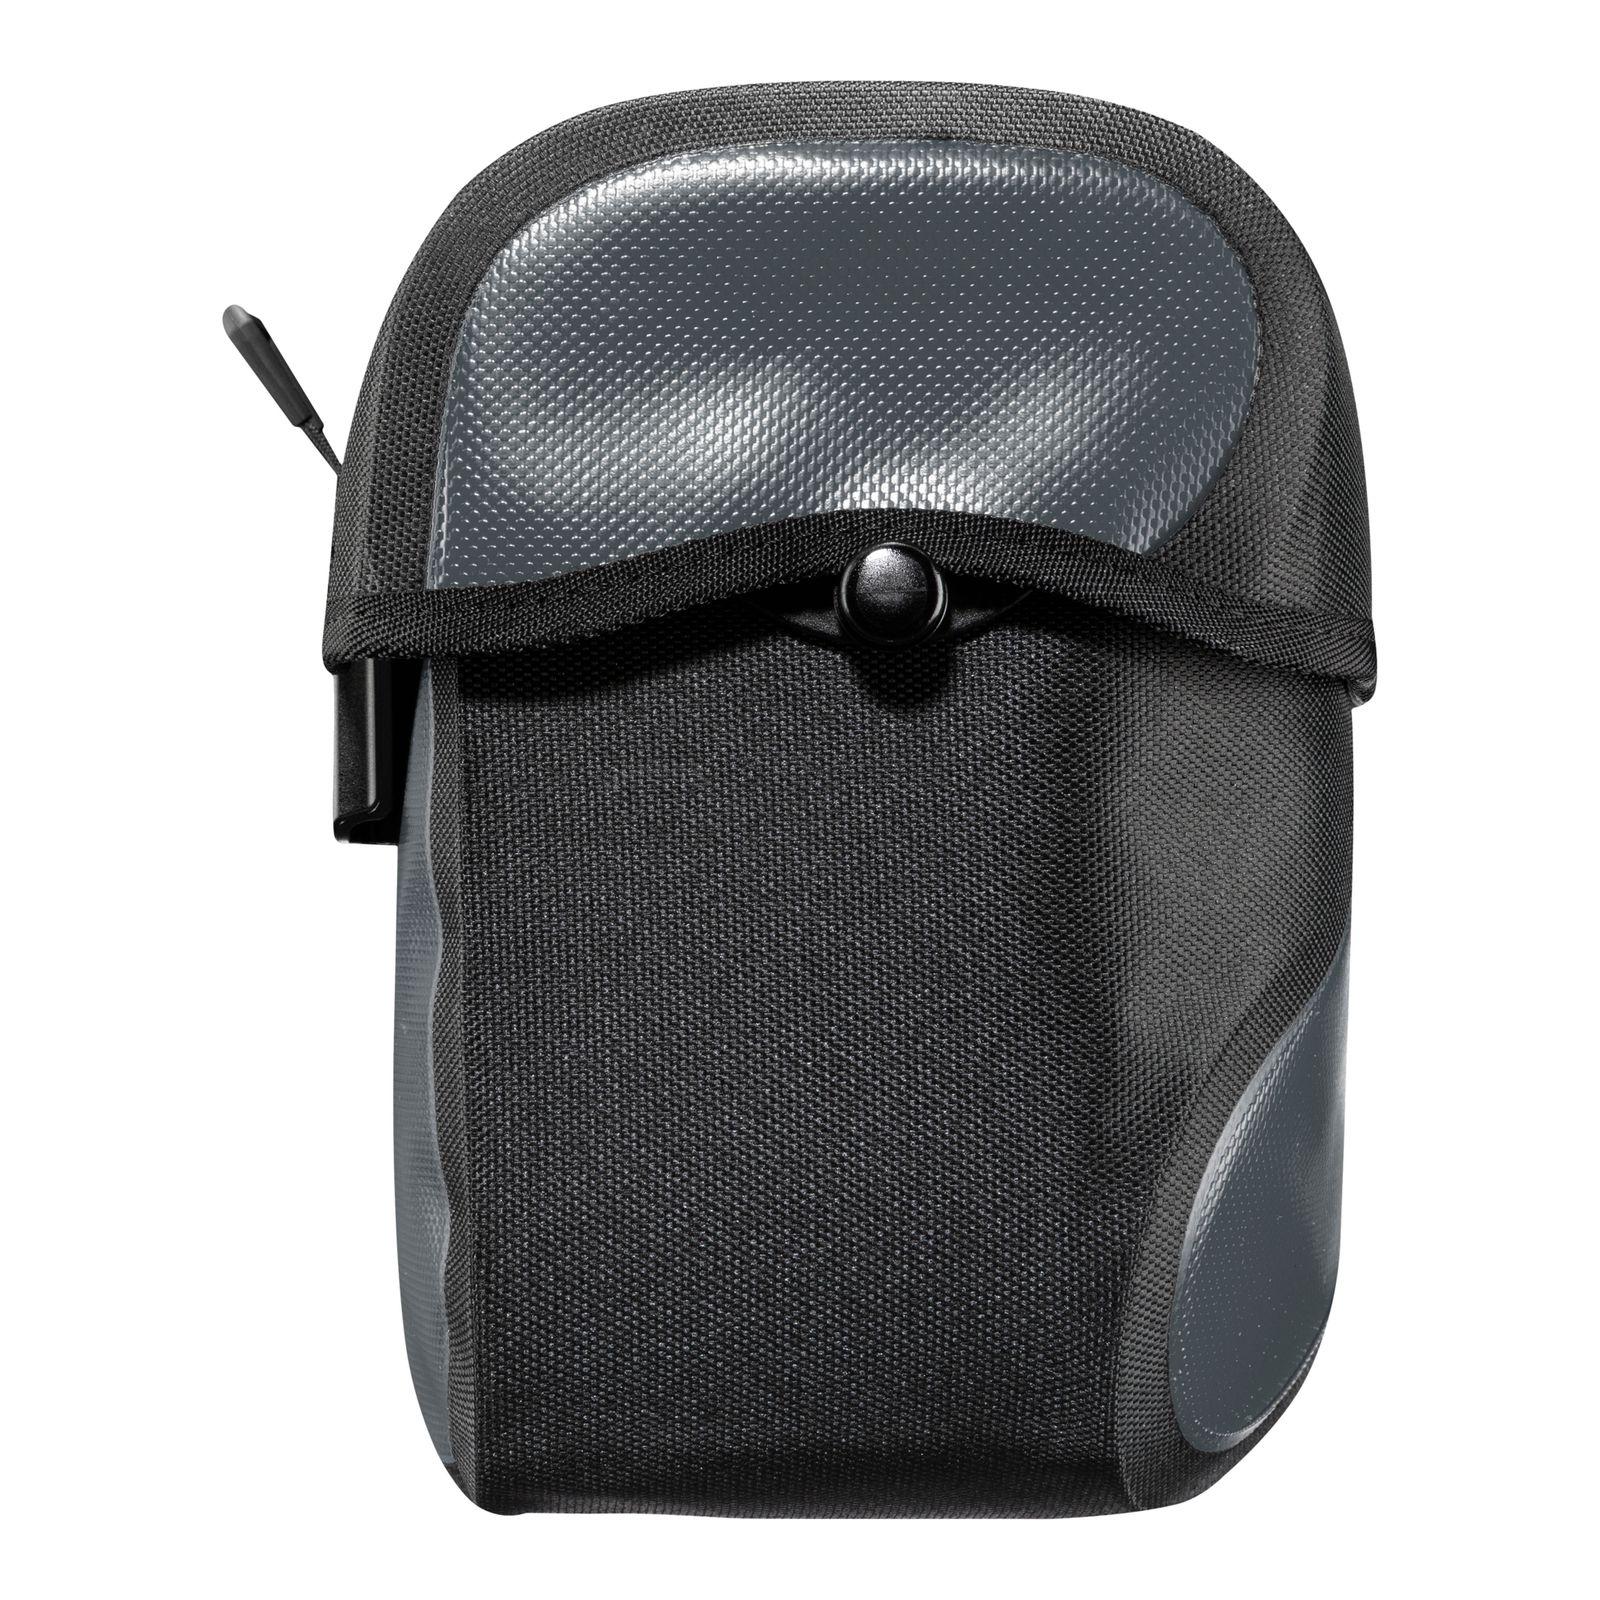 ORTLIEB Classic Ultimate Six Bike Handlebar Bag 7L Asphalt-Black